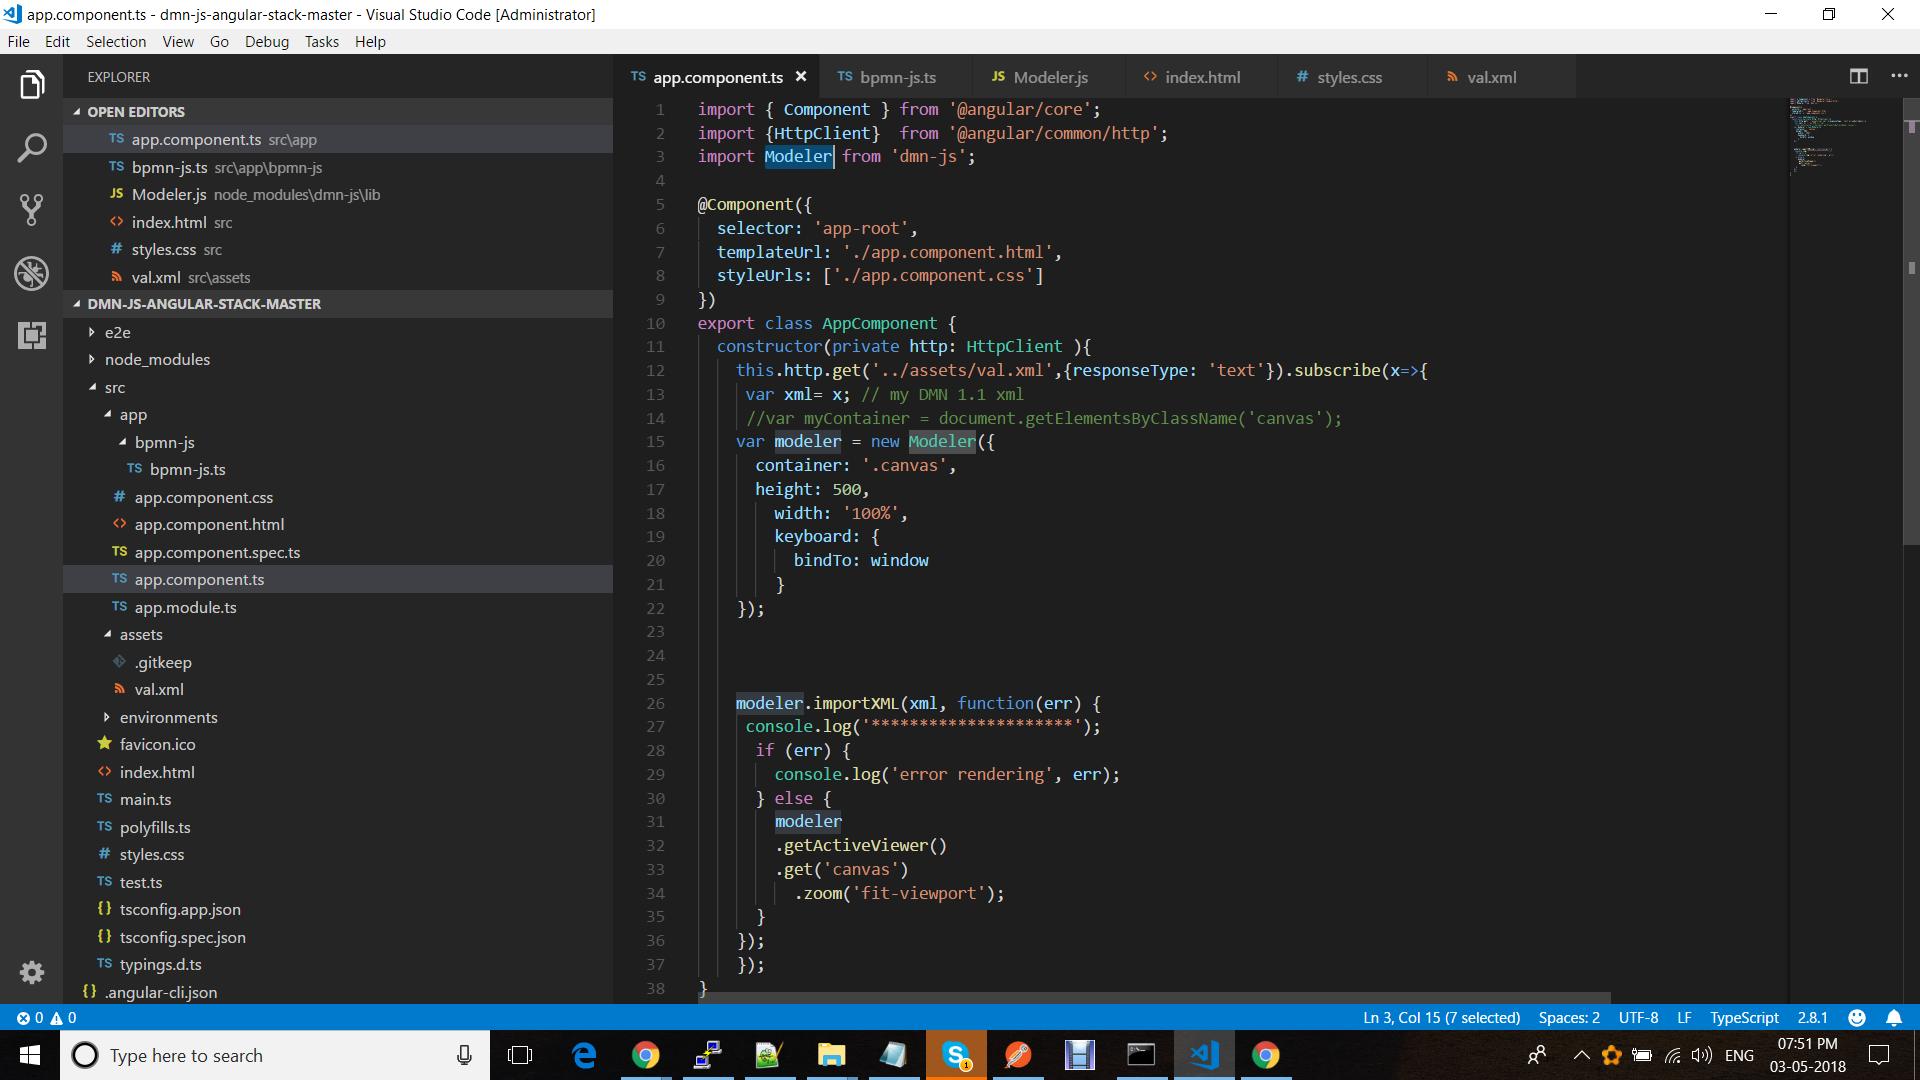 Dmn-js Moduler with Angular 5 - Modeler - Forum - bpmn io